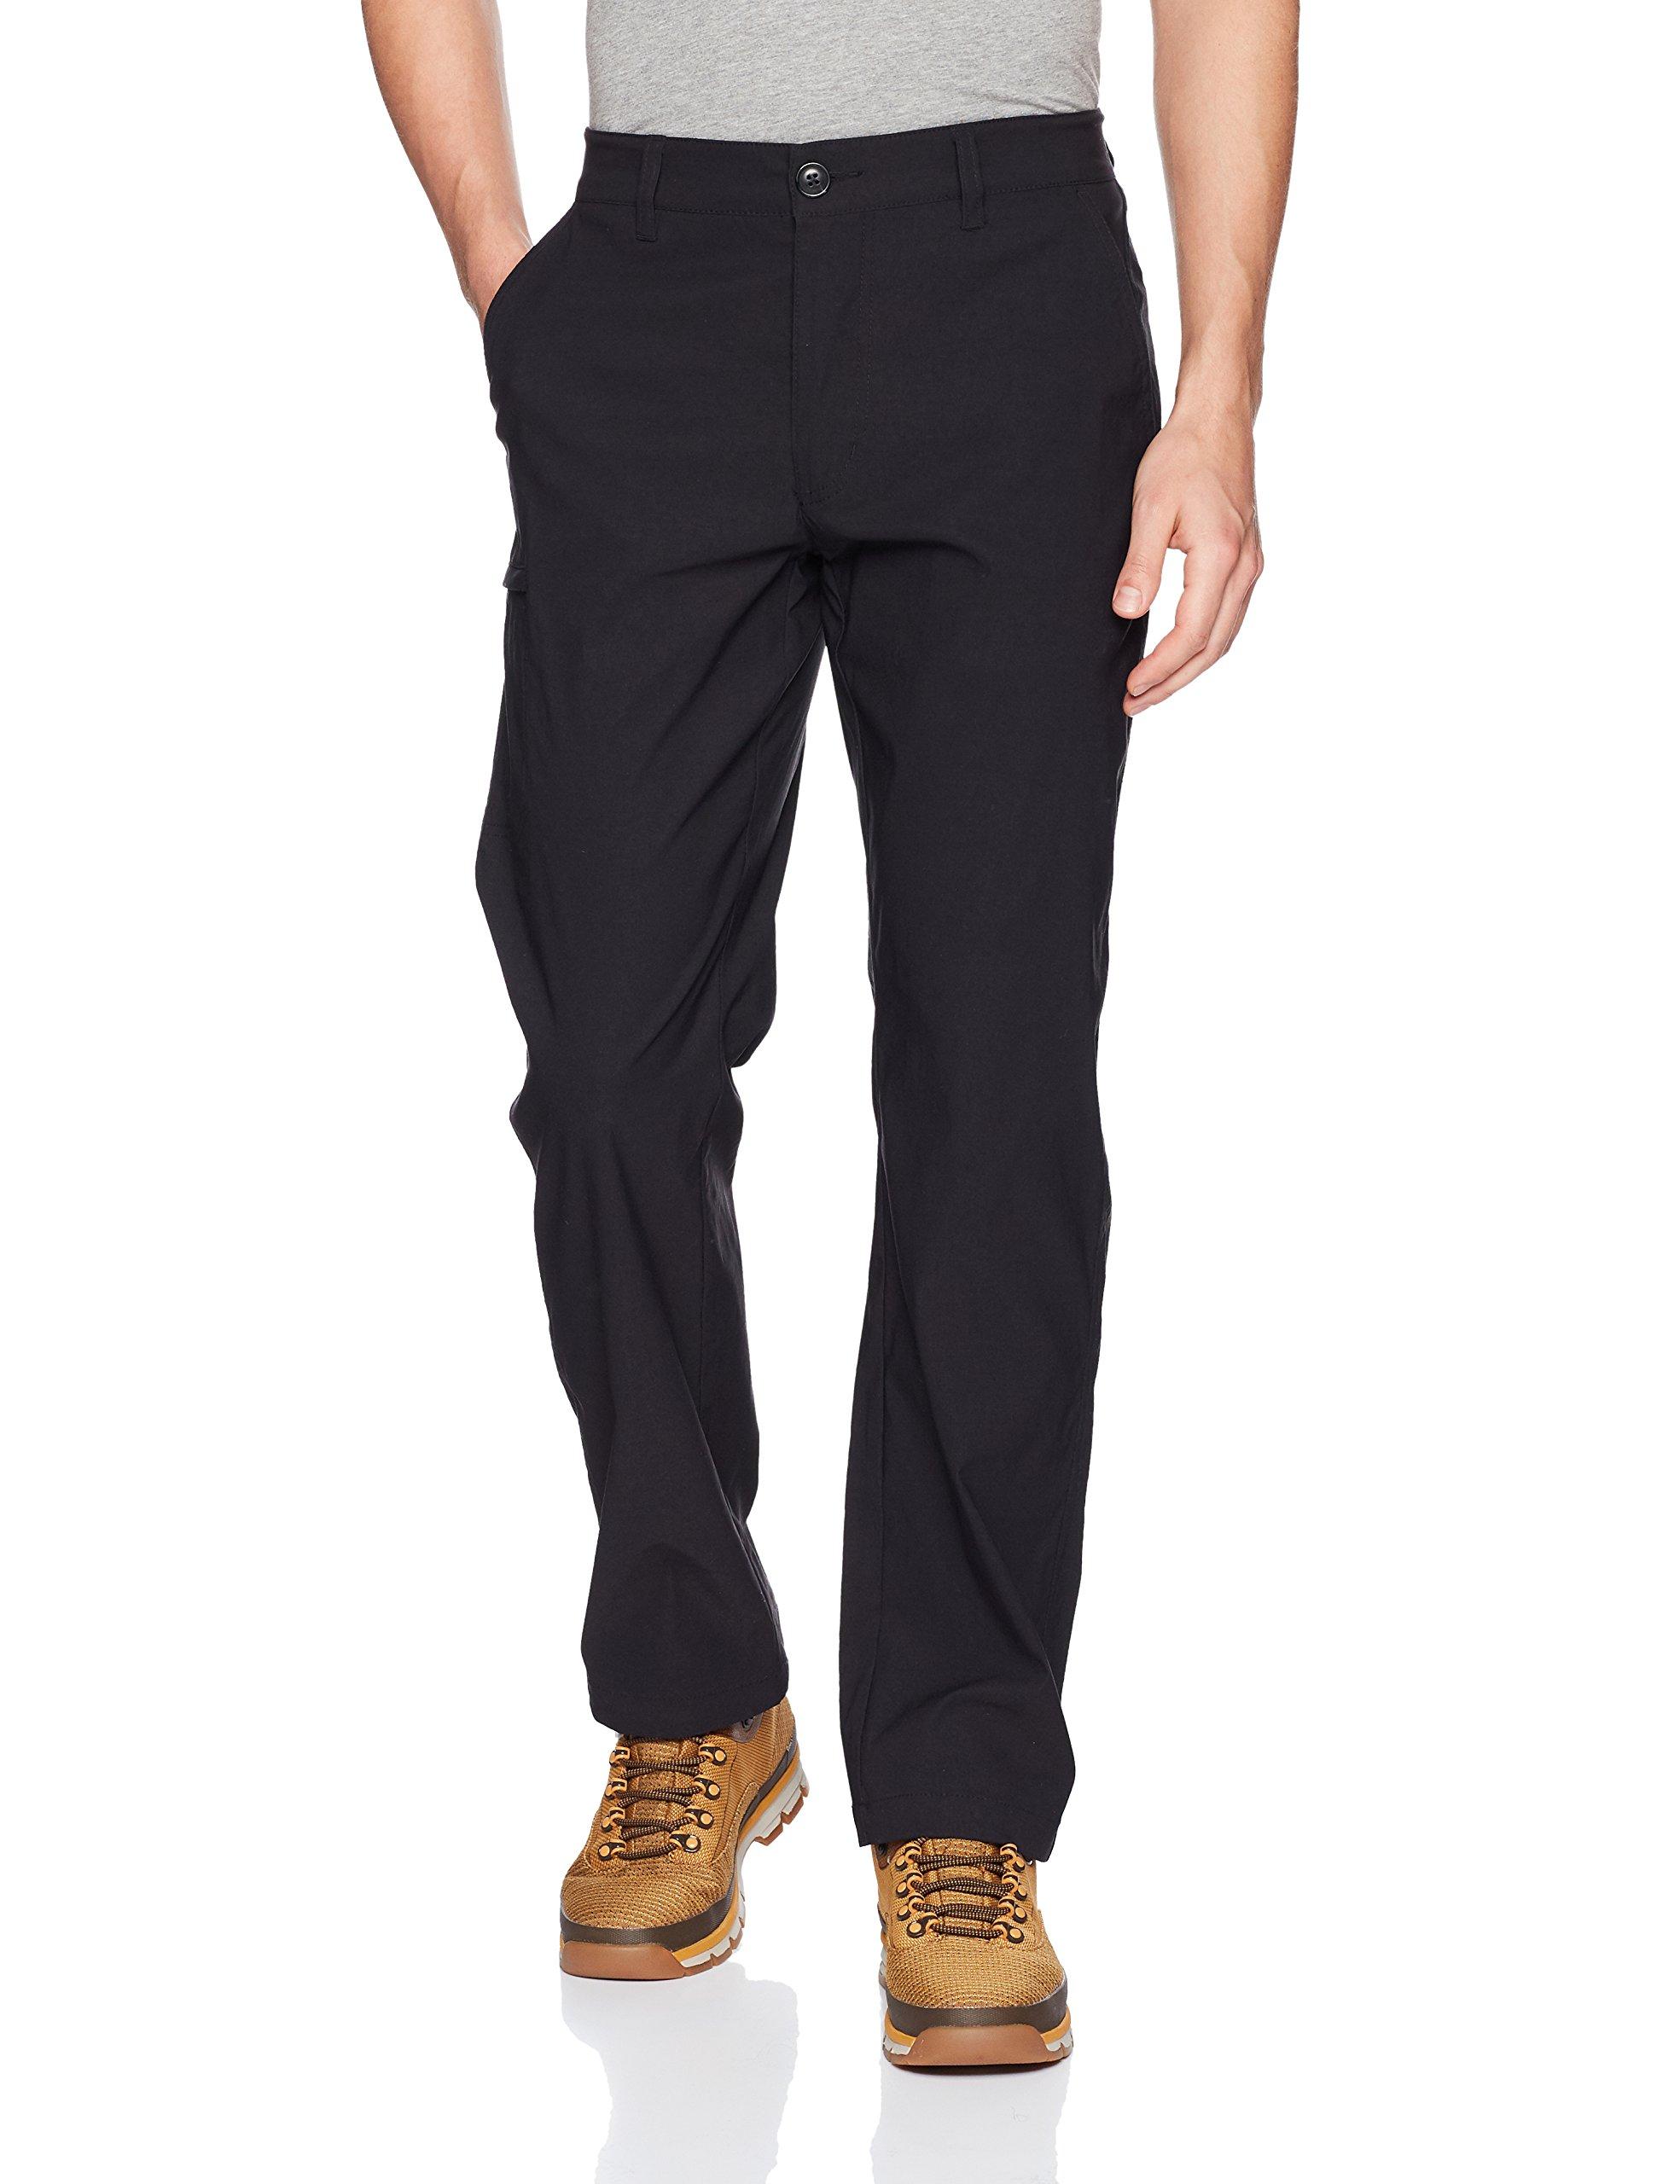 UNIONBAY Men's Rainier Lightweight Comfort Travel Tech Chino Pants, Black, 36x32